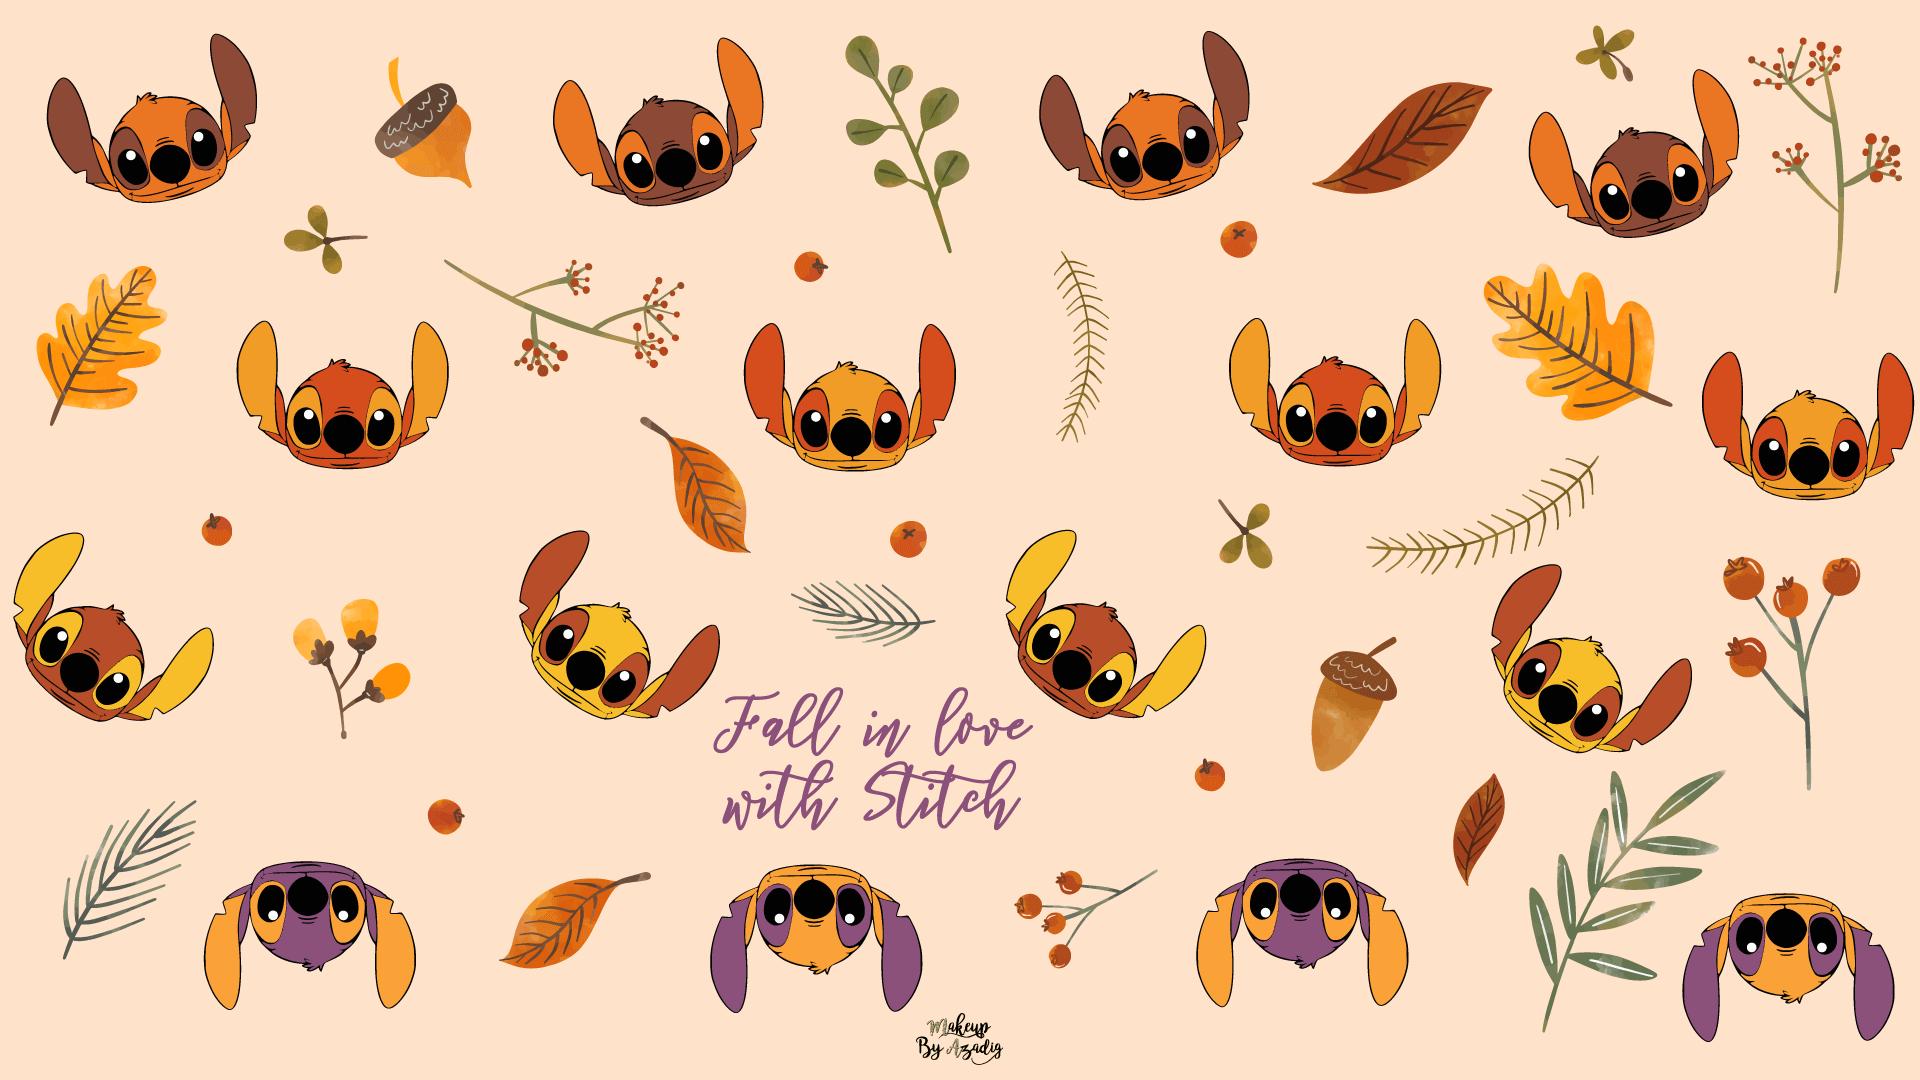 fond-decran-wallpaper-stitch-autumn-automne-fallinlove-disney-ordinateur-mac-macbook-imac-pc-makeupbyazadig-tendance